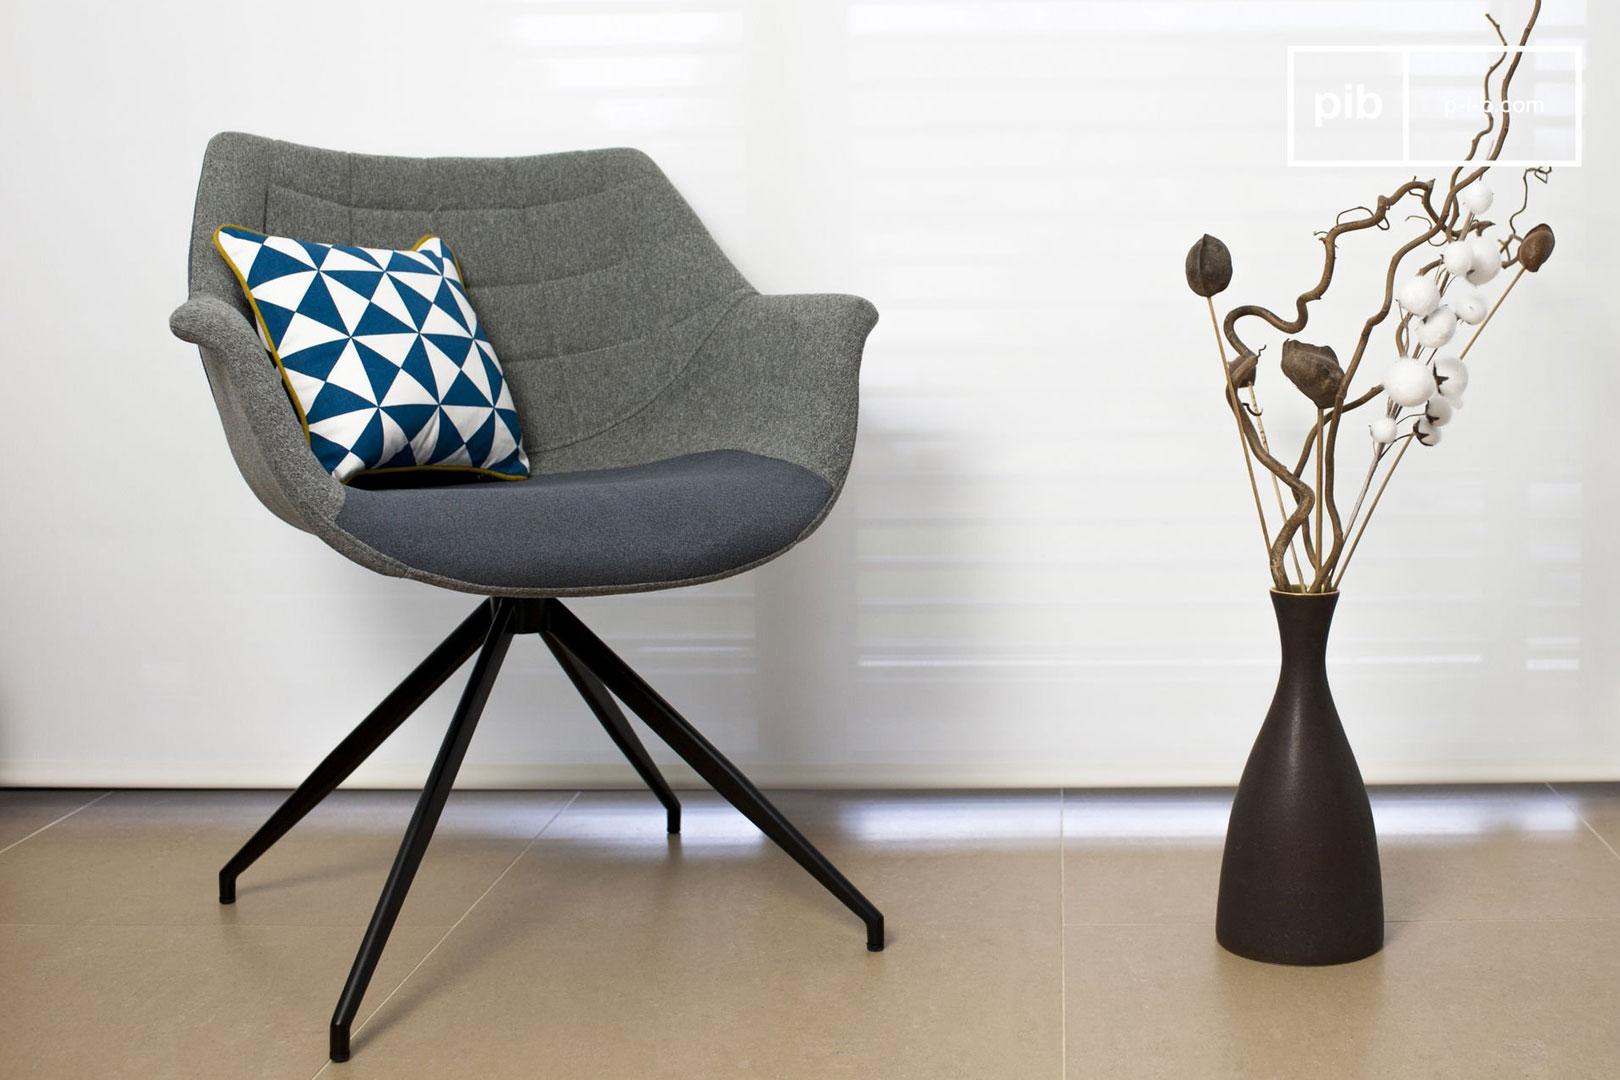 Sessel mit skandinavischen Linien